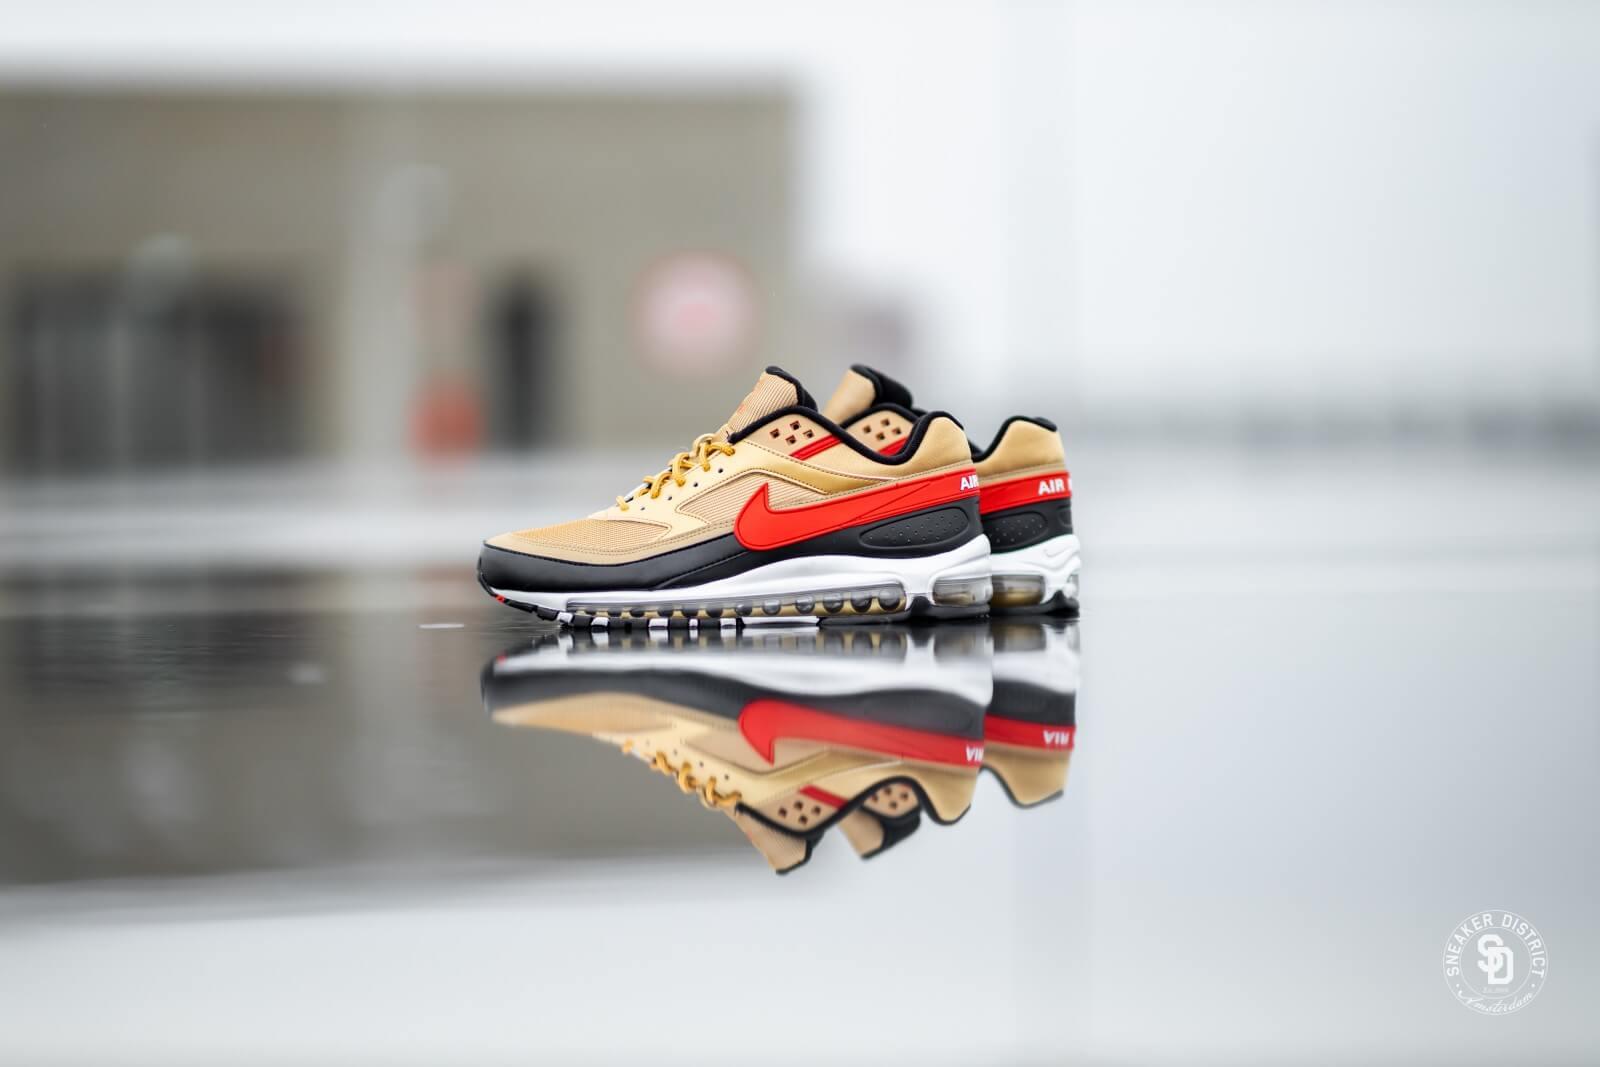 Nike Air Max 97BW Metallic GoldUniversity Red Black AO2406 700